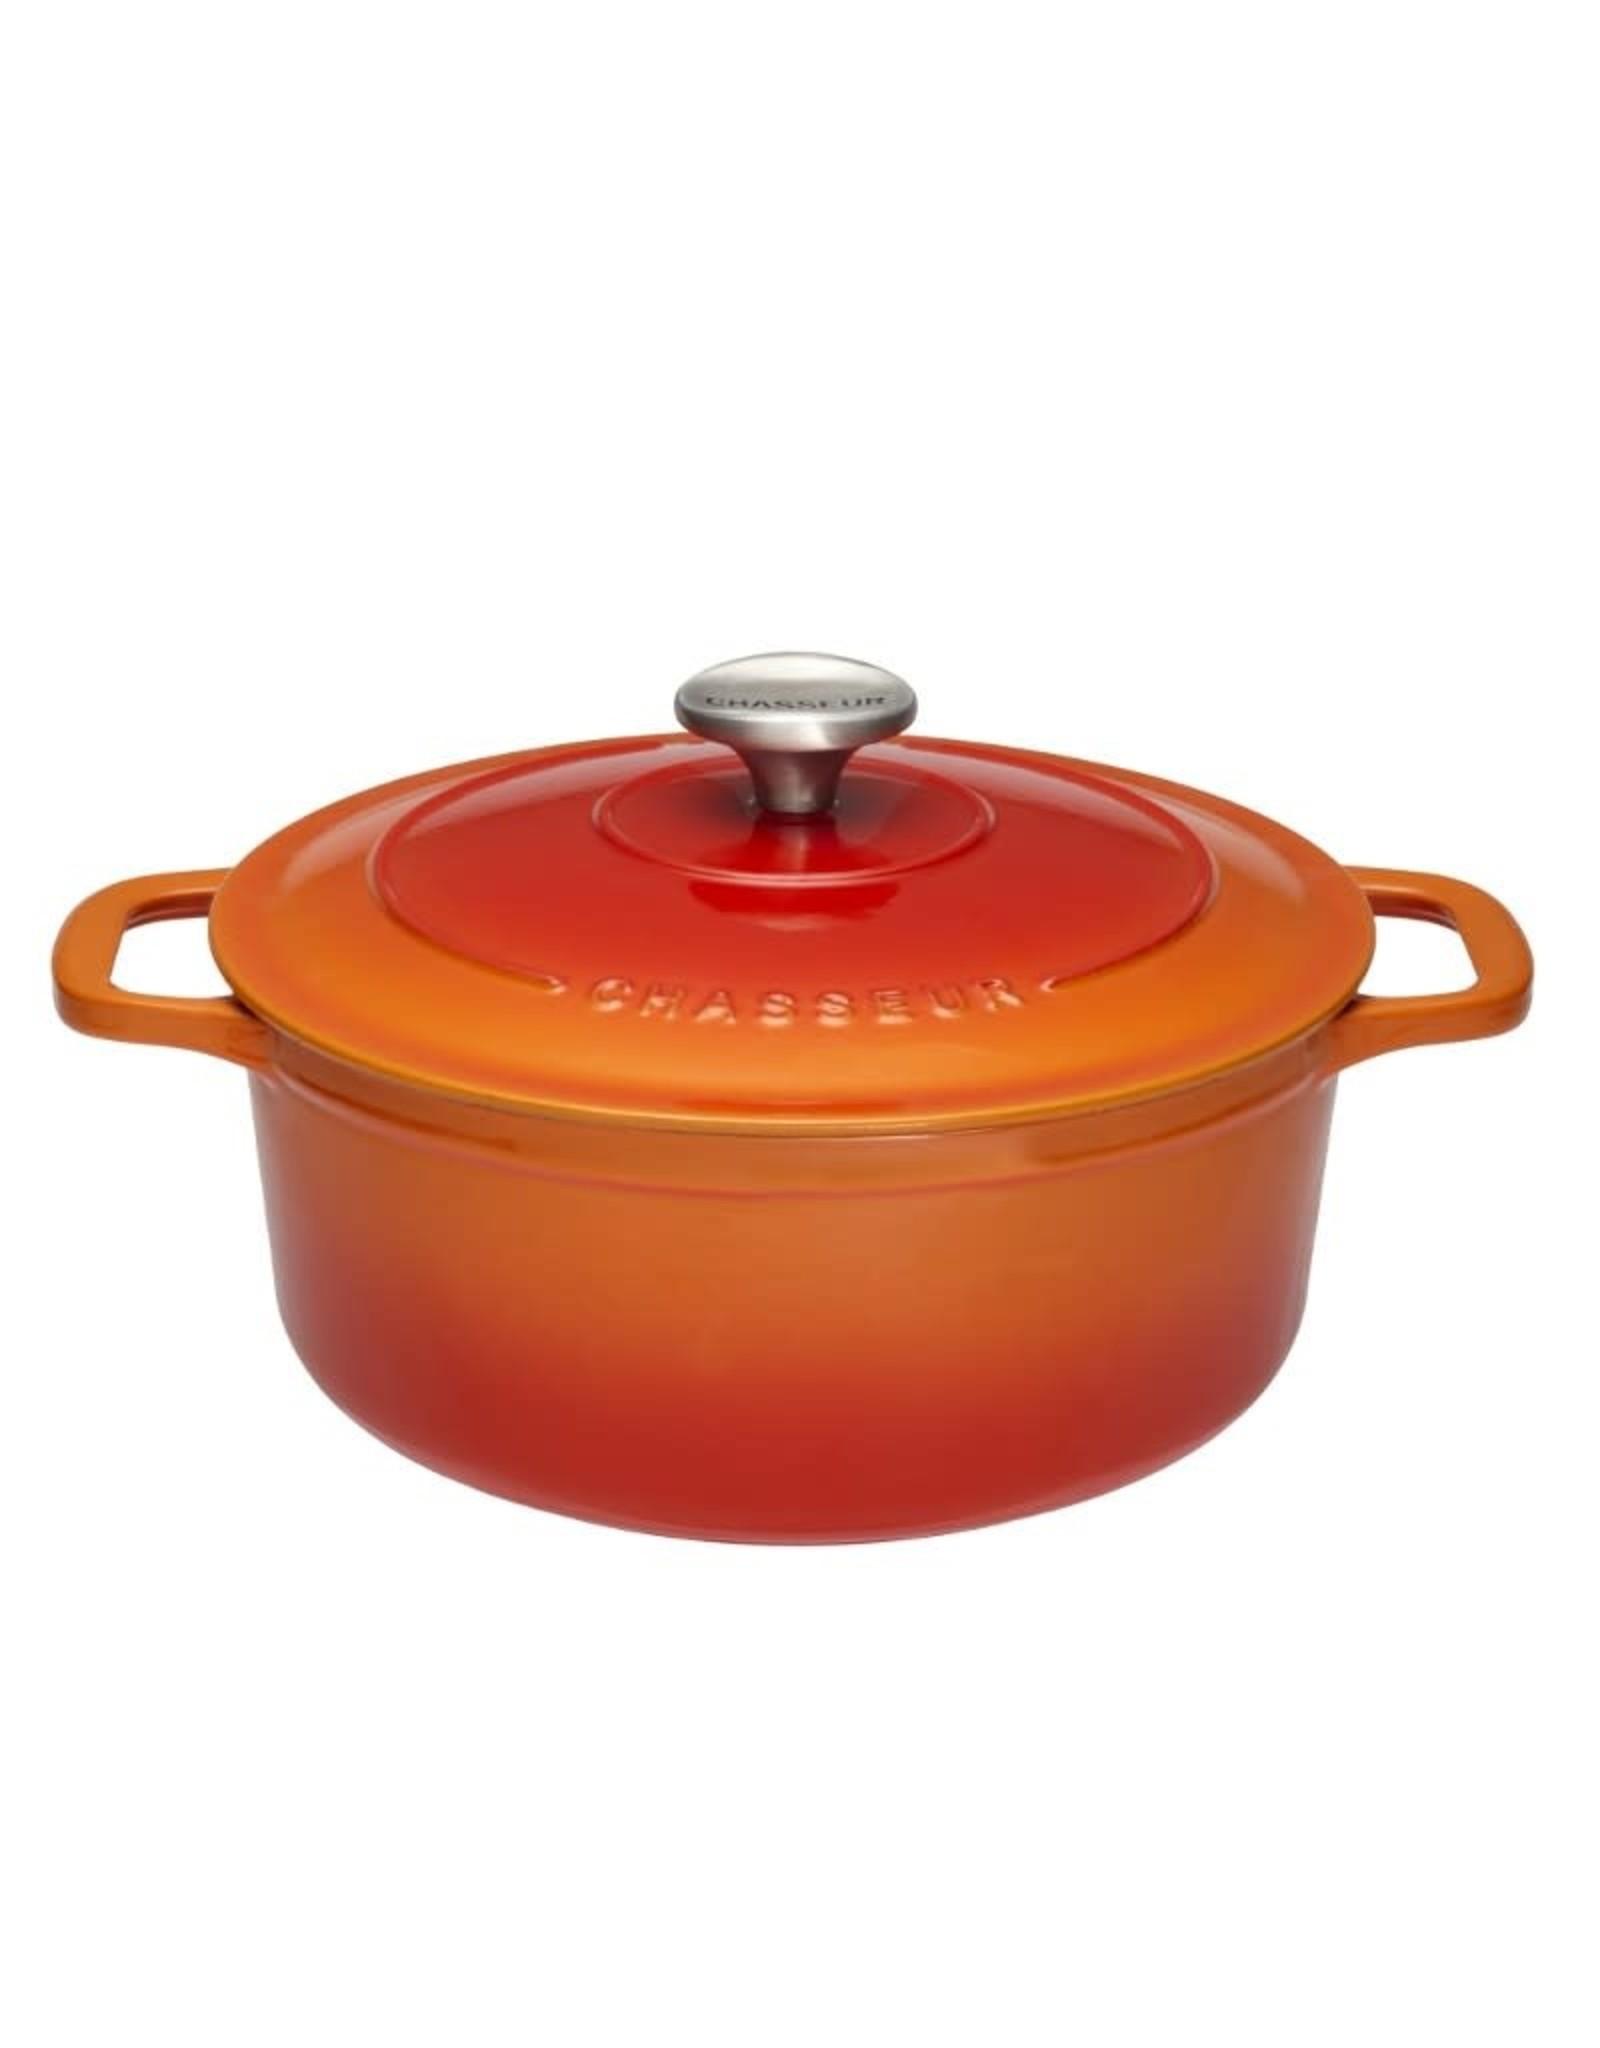 Chasseur Cocotte rond 22cm 3,2L oranje